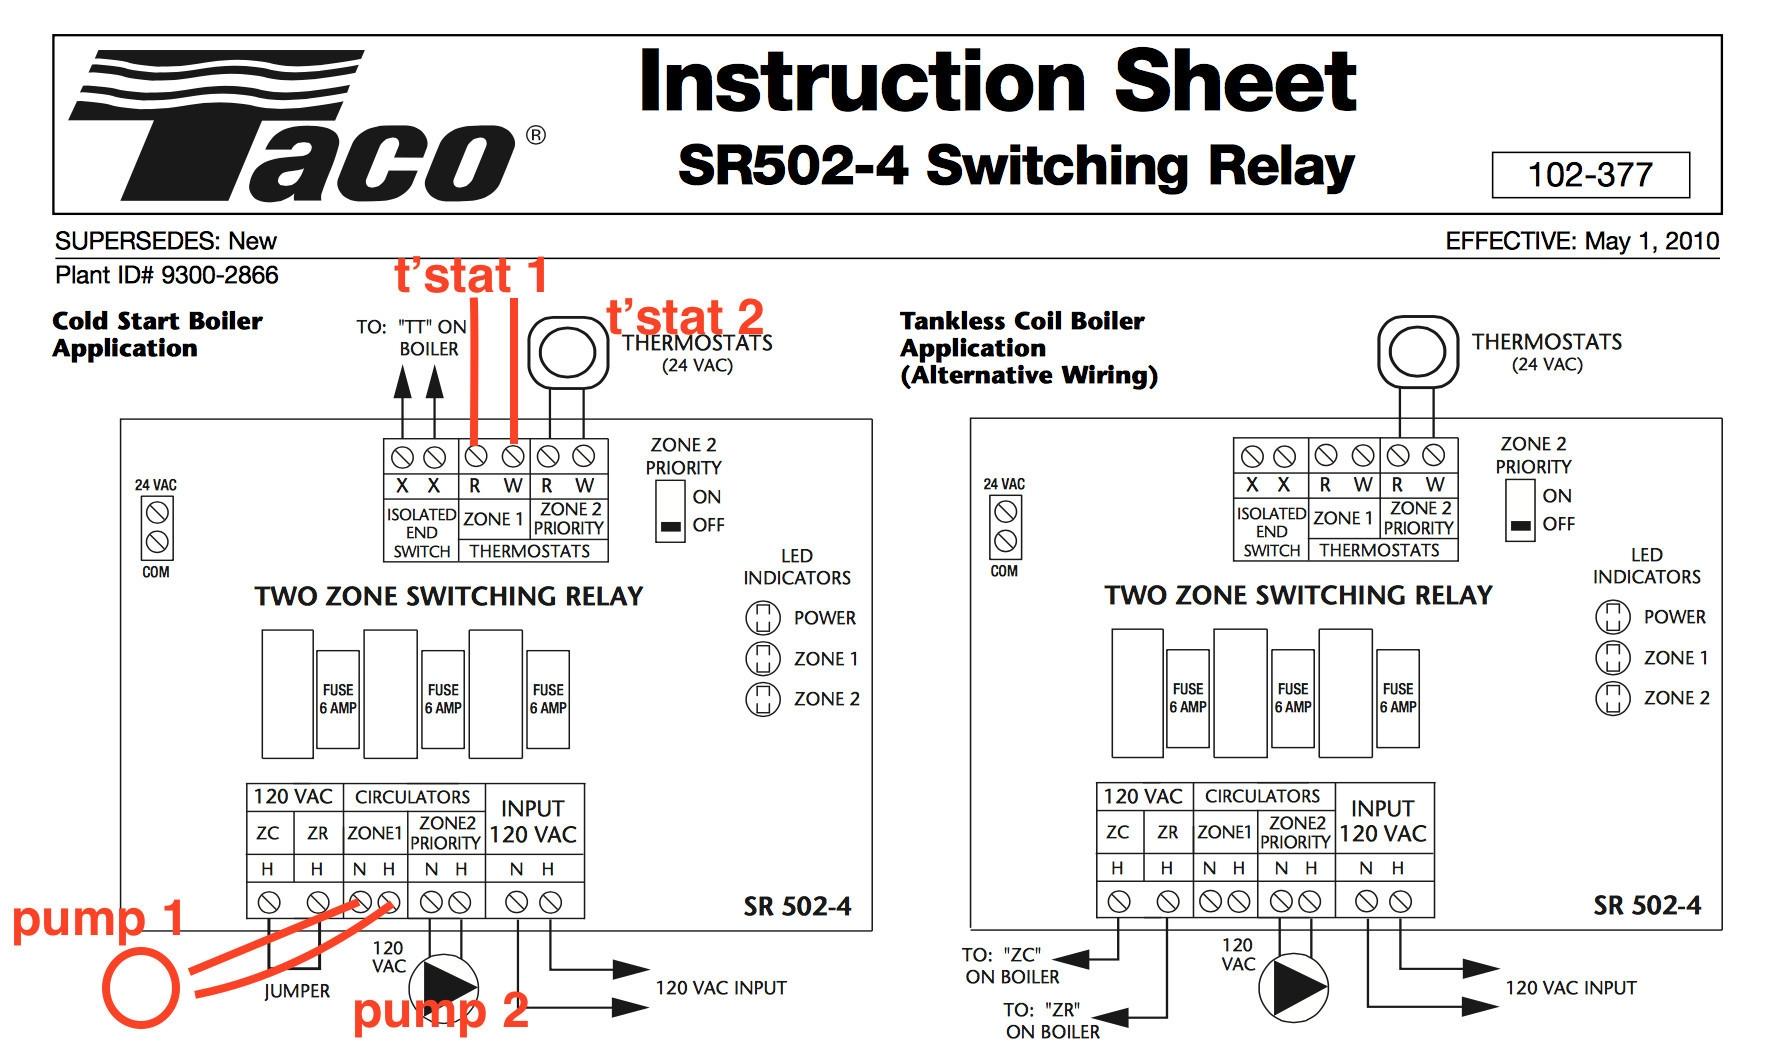 taco 007 f5 wiring diagram wiring diagram taco 007 f5 wiring diagram wiring diagram detail taco circulator 5h